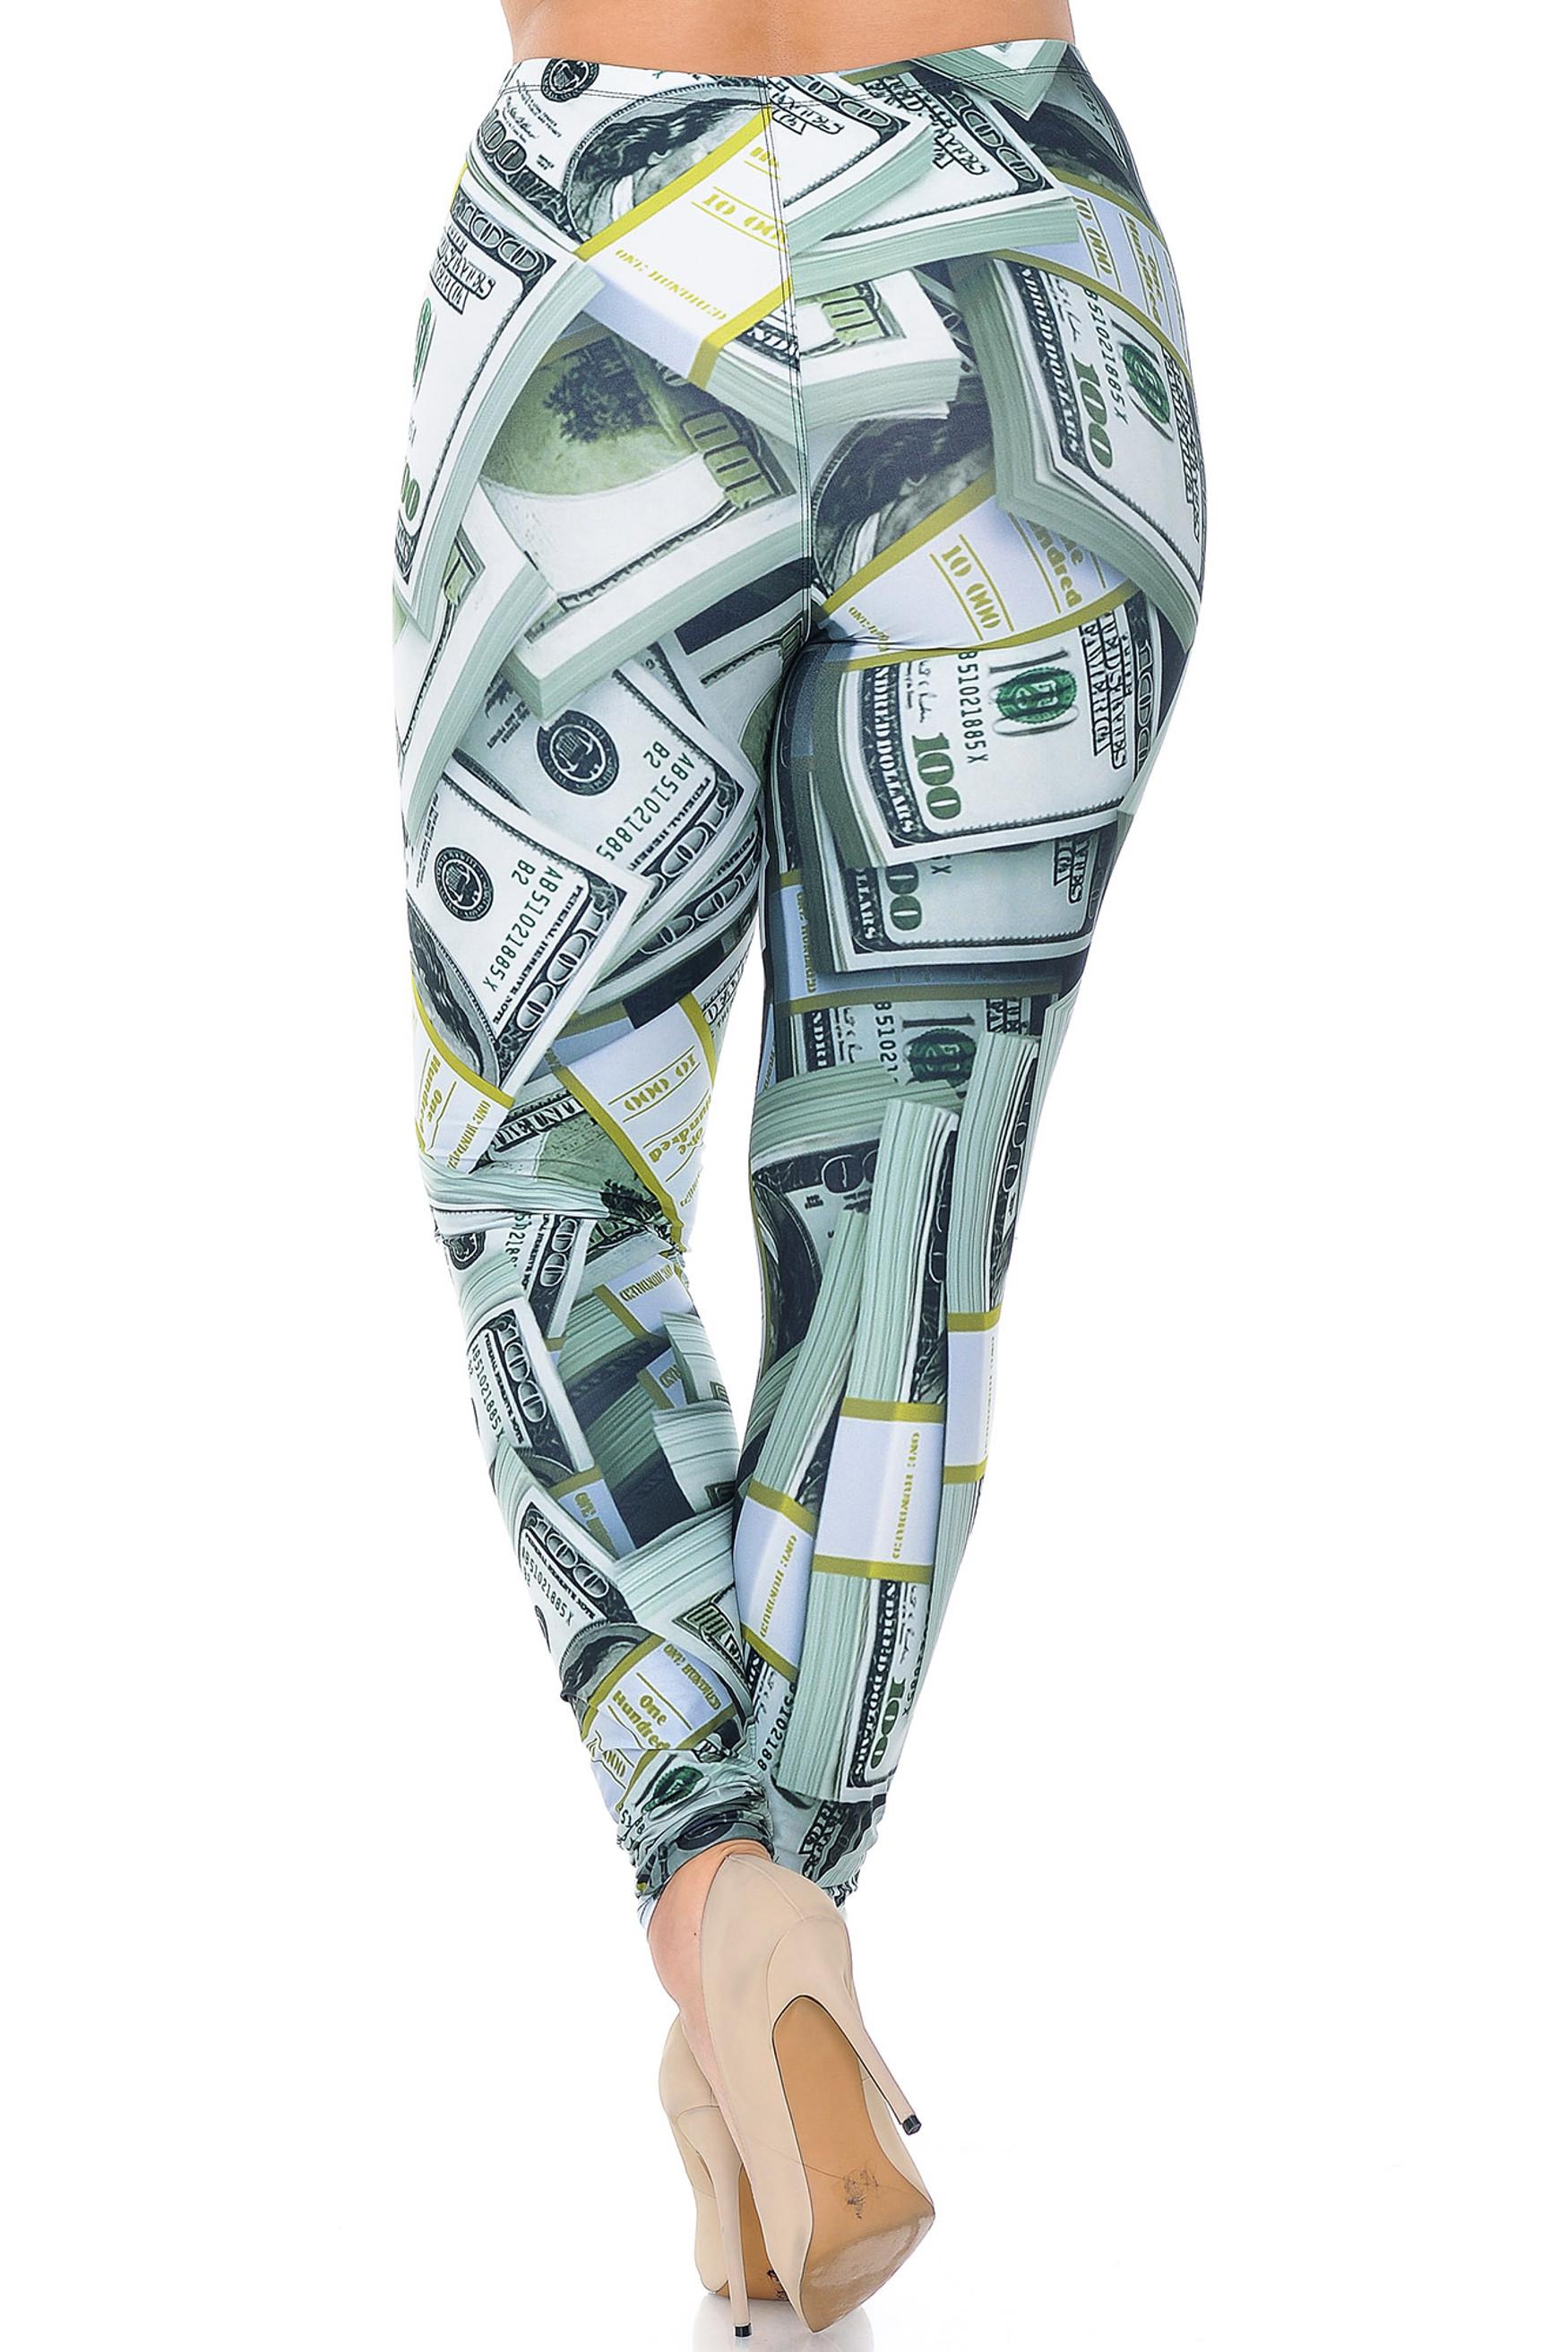 Creamy Soft Cash Money Extra Plus Size Leggings - 3X-5X - USA Fashion™